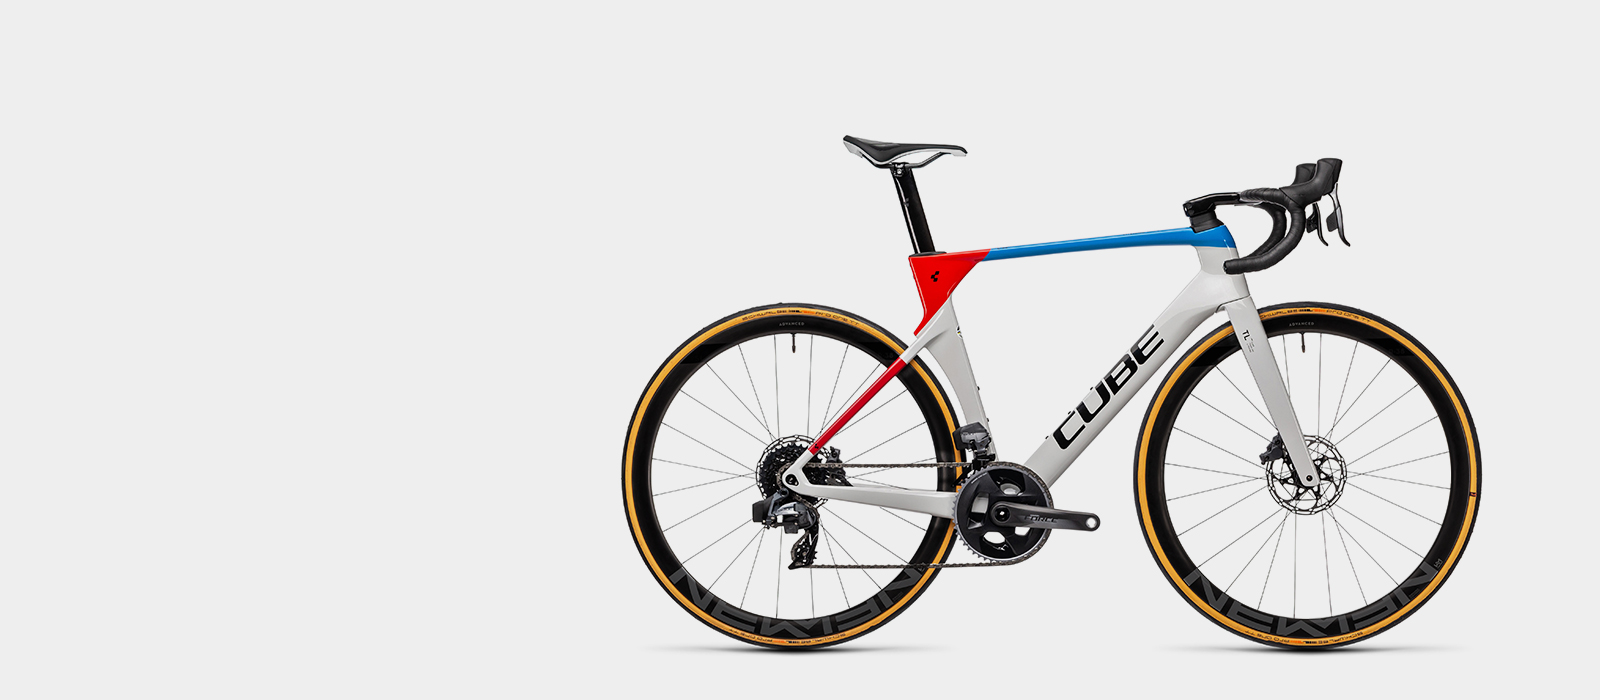 njustudio_Cube_bikes_Litening_2021